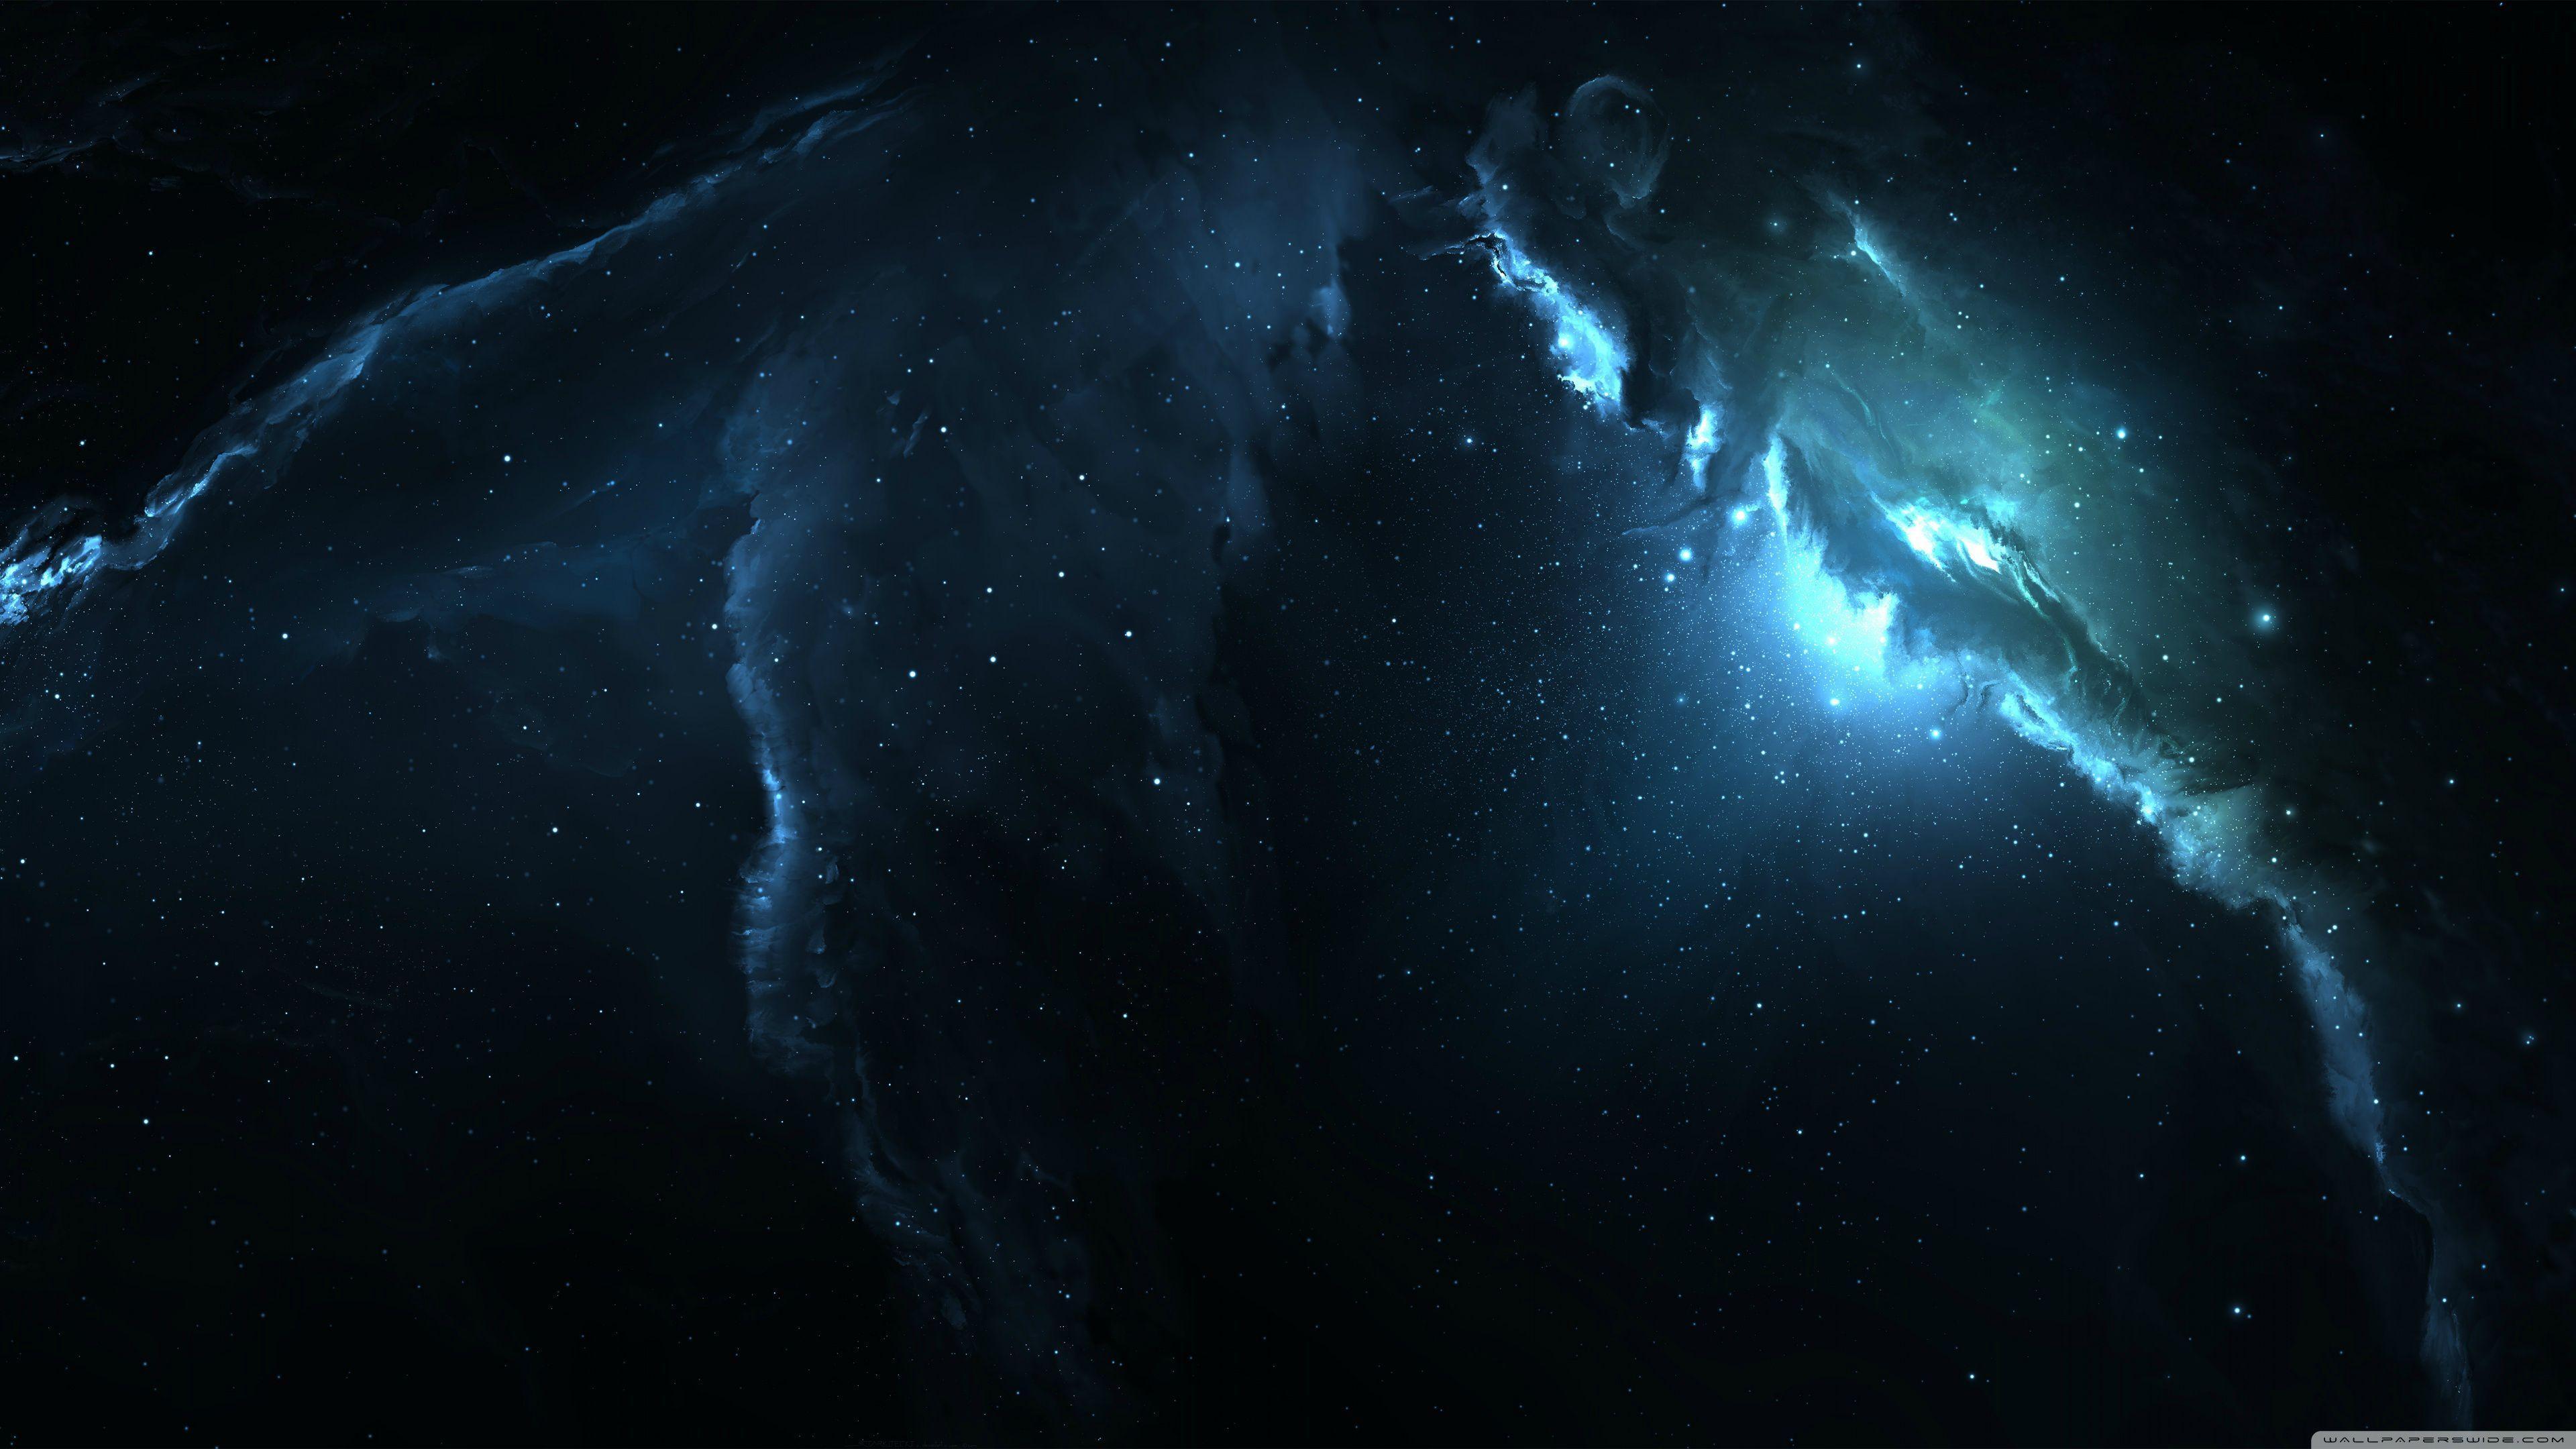 Space Wallpaper 4k Free Download